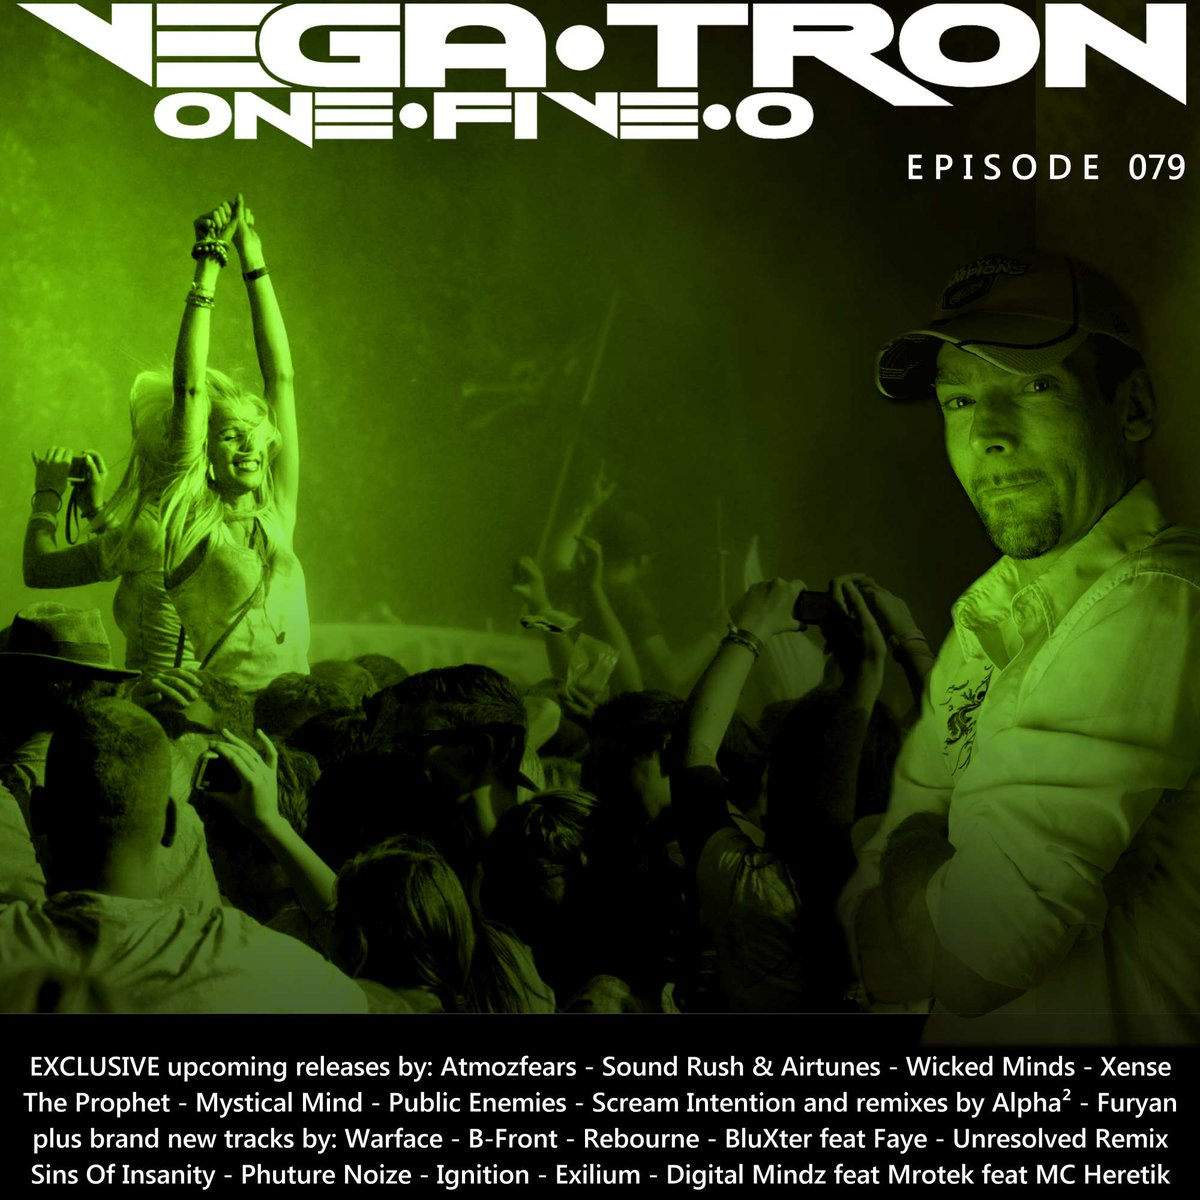 VegaTron079 hashtag on Twitter